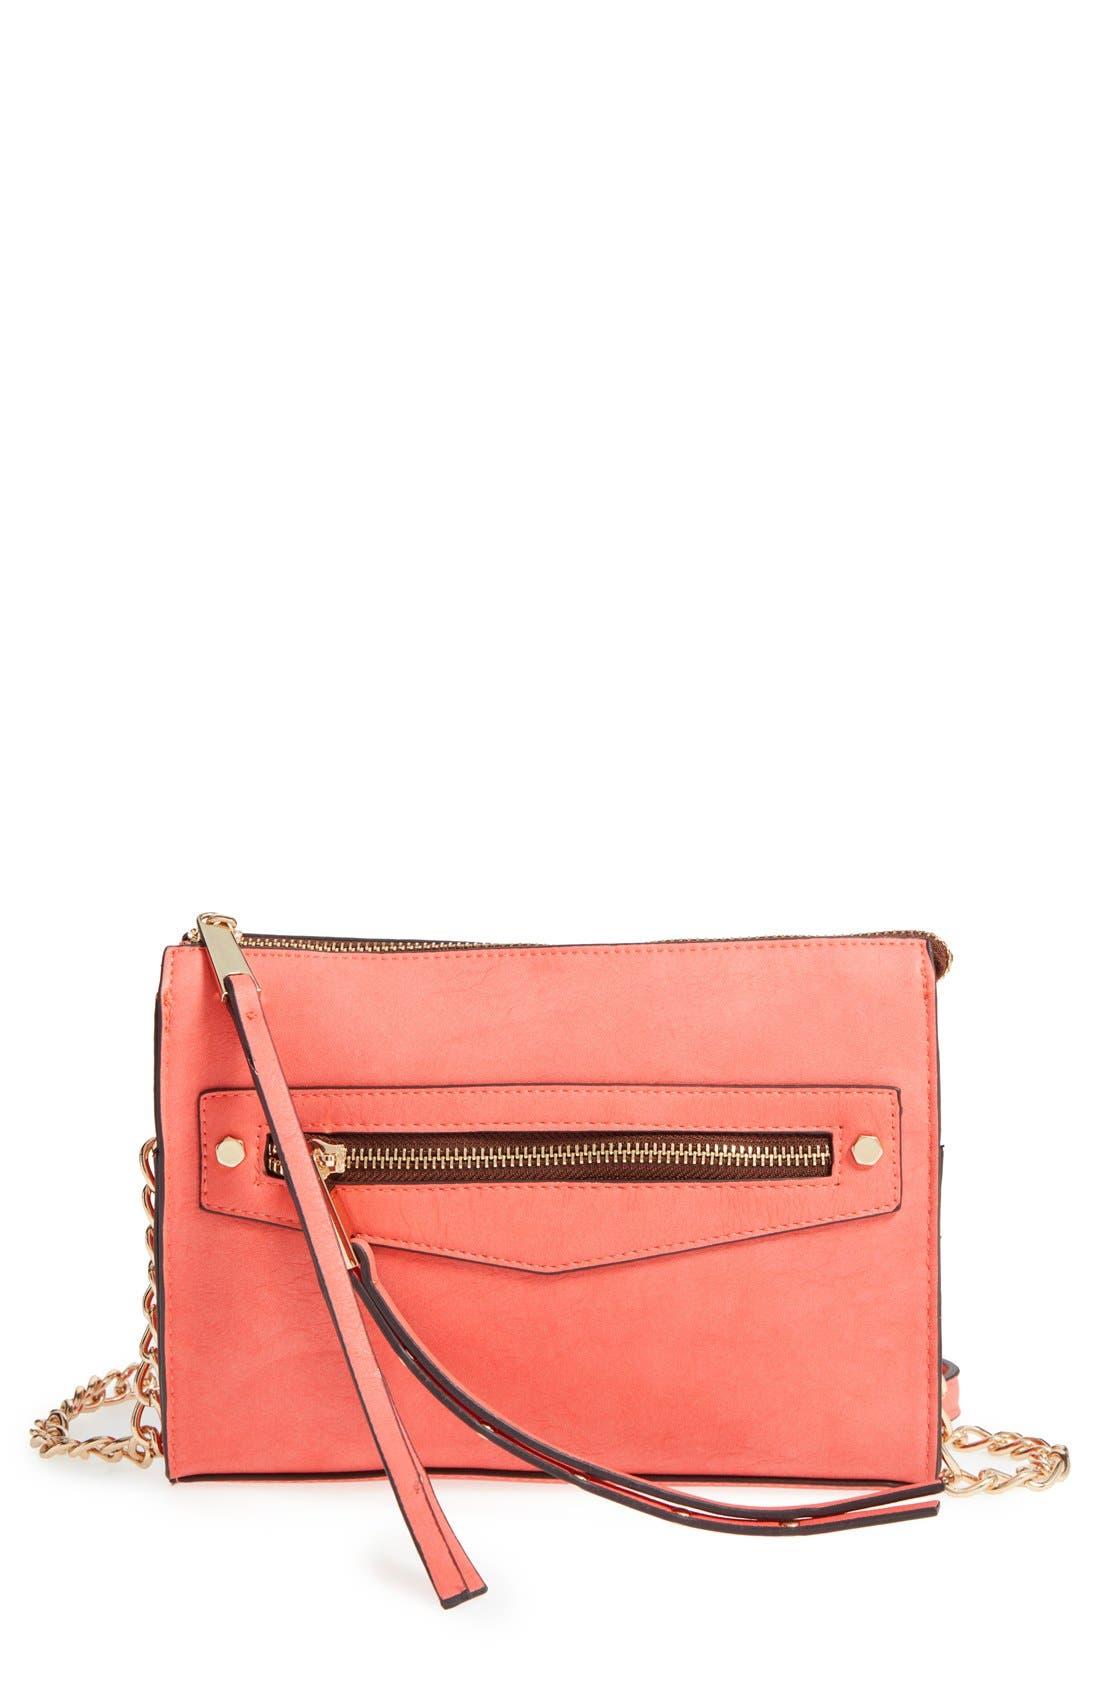 Alternate Image 1 Selected - Dolce Girl Stud Crossbody Bag